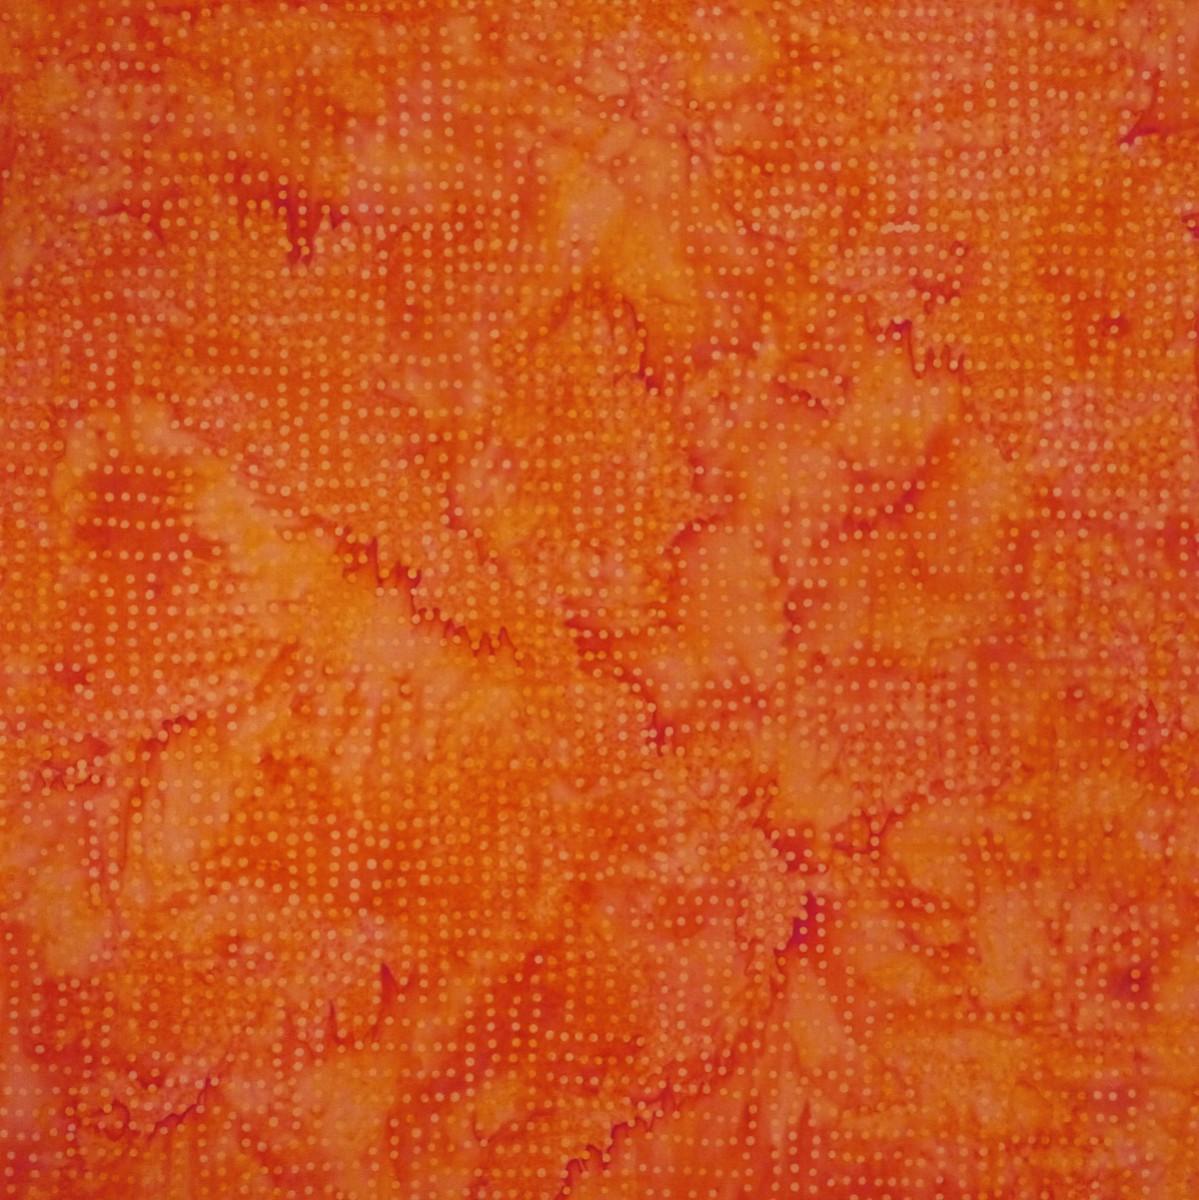 SD-7-9262 Make Up Orange (1)